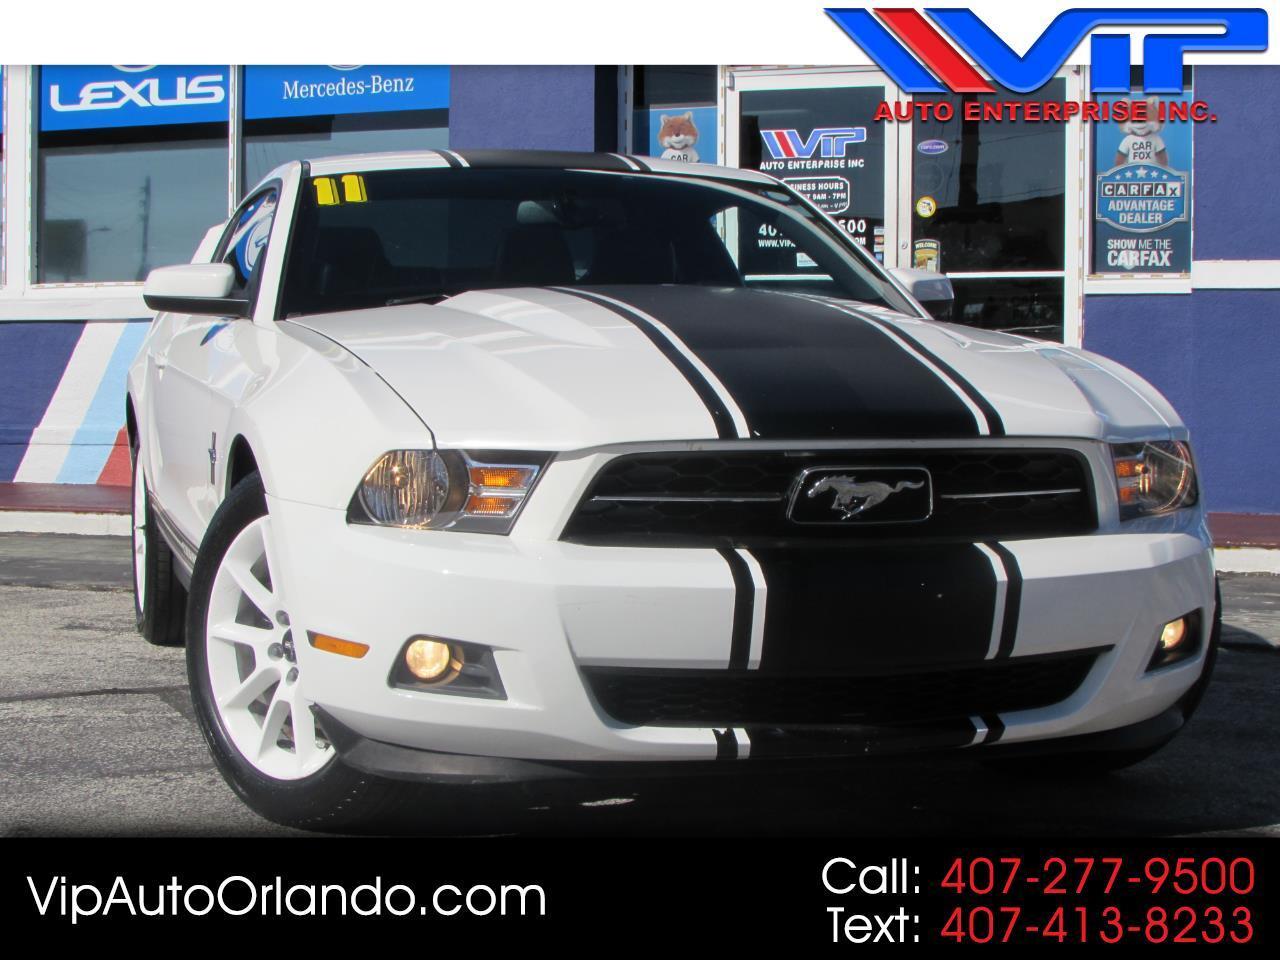 2011 Ford Mustang 2dr Cpe V6 Premium